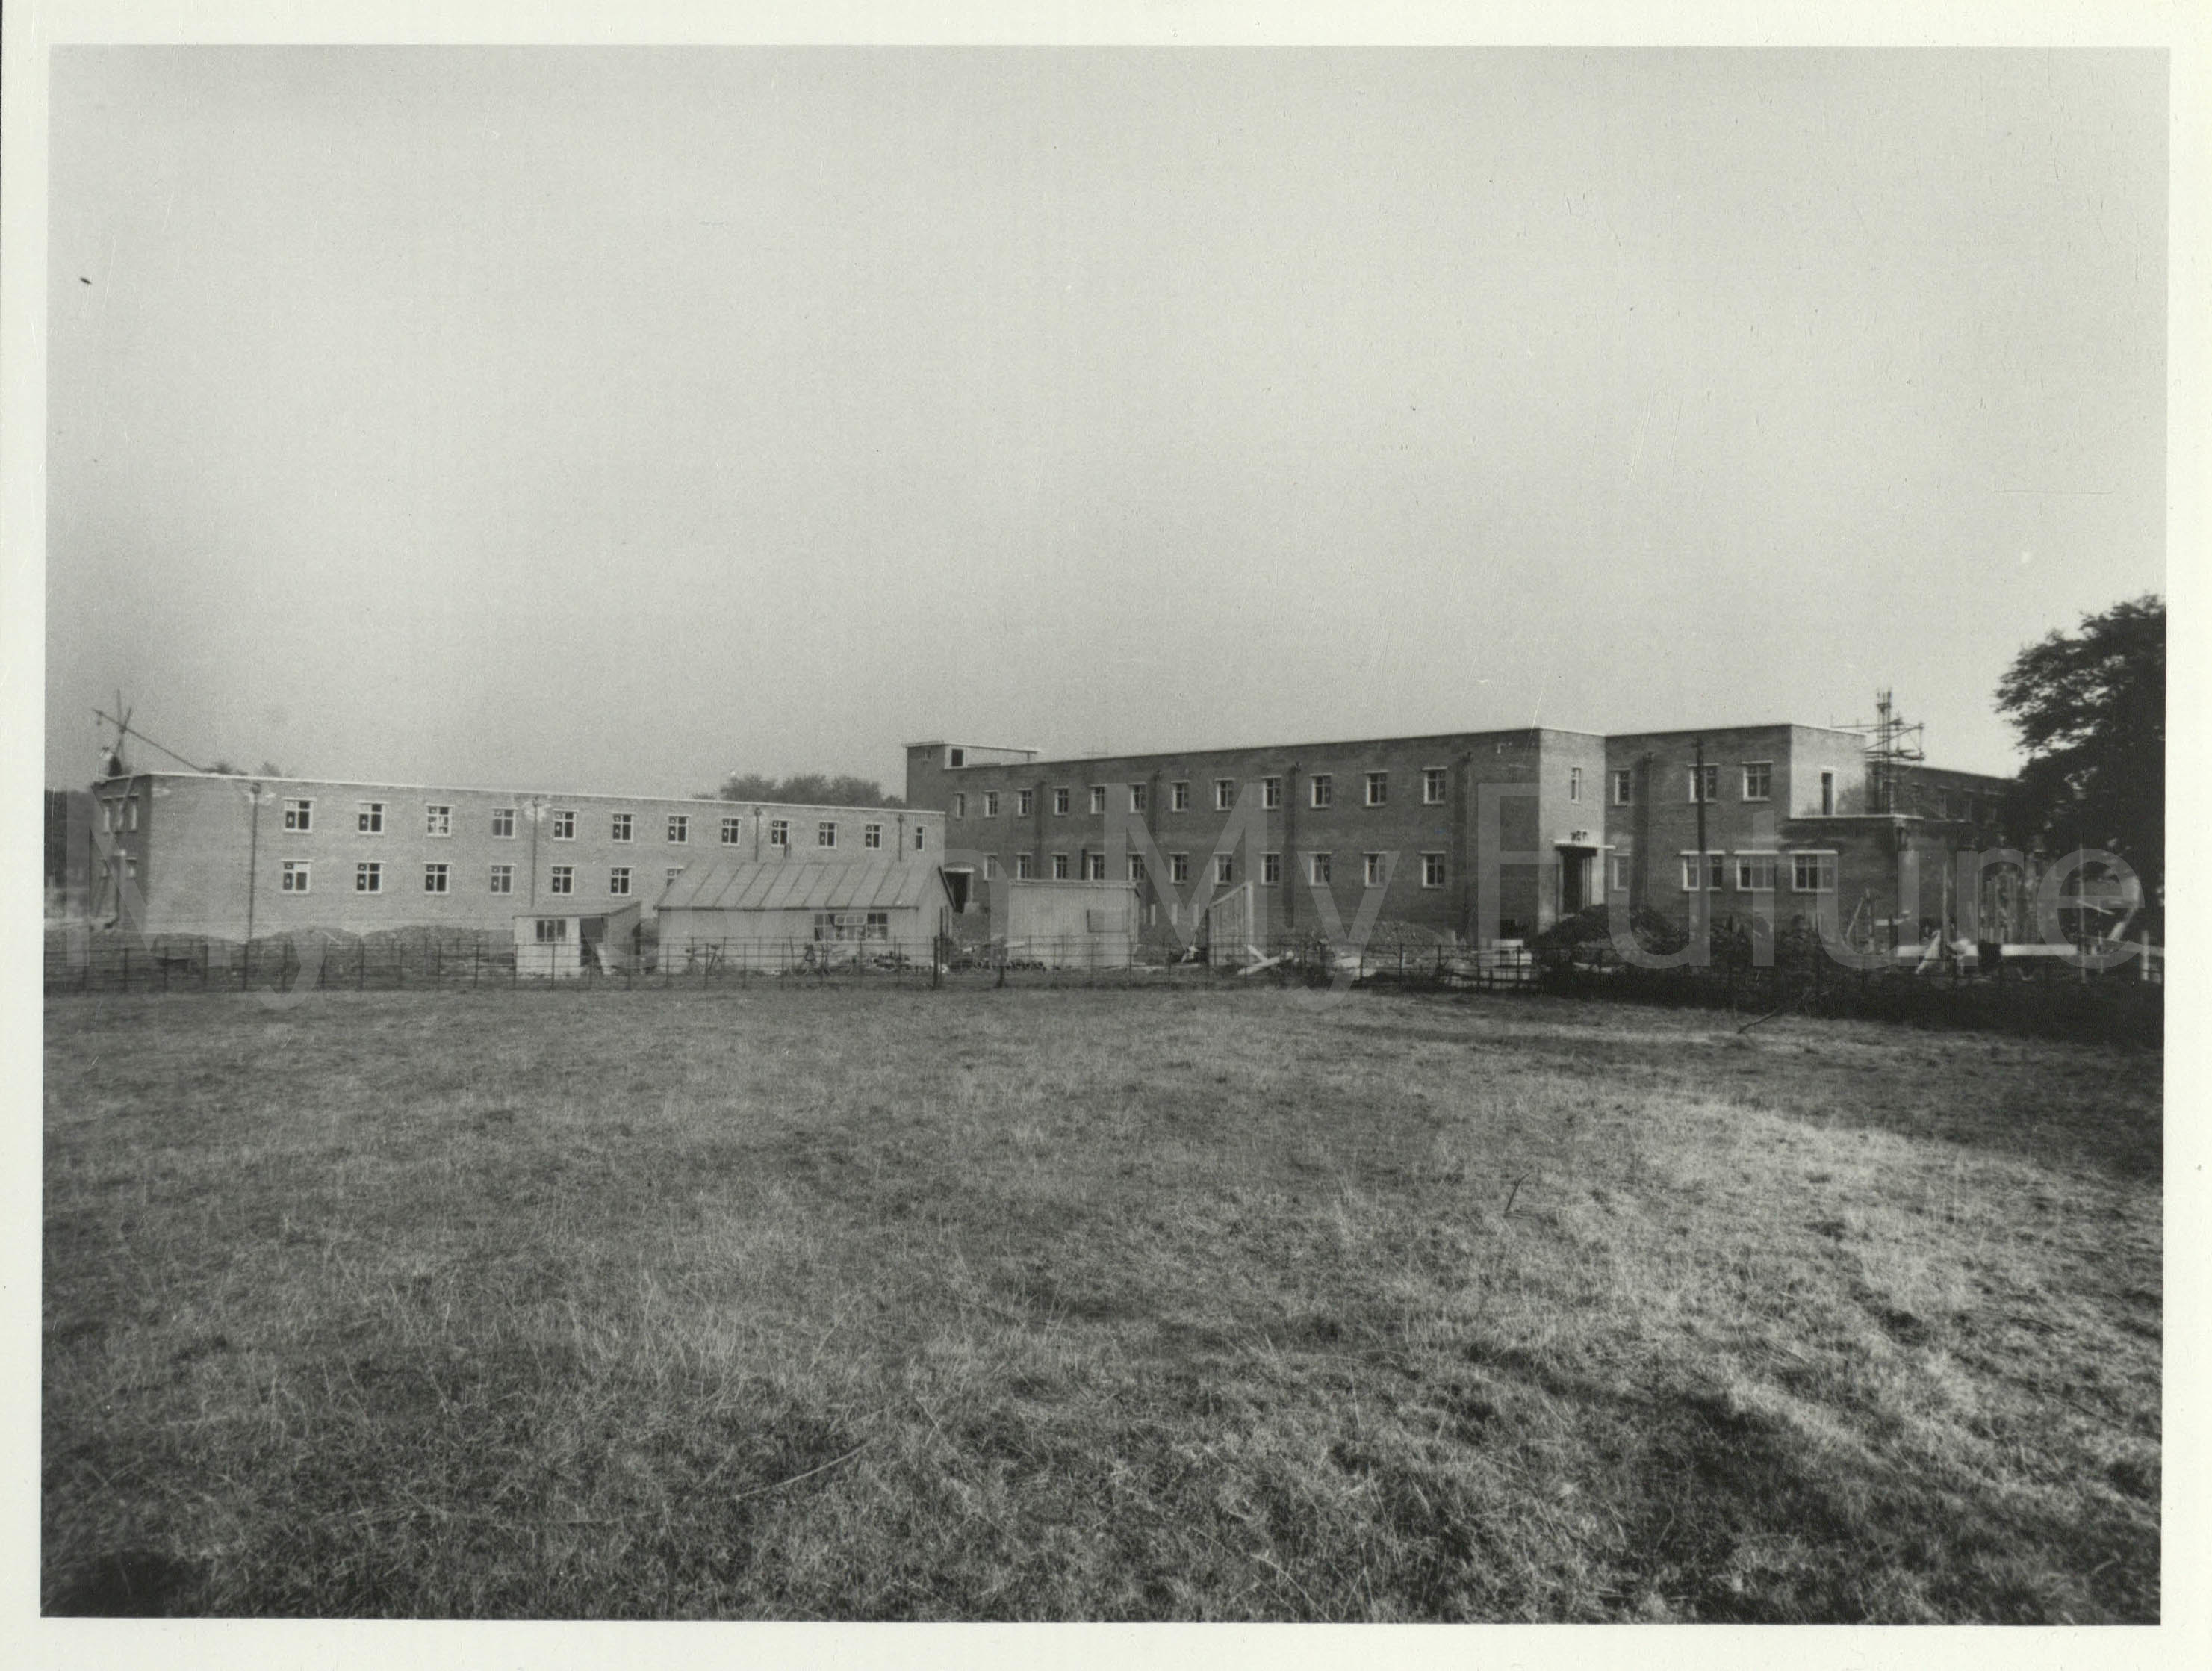 Nurses' Home, Poole Hospital Sanatorium (under construction) (Oct 1939)